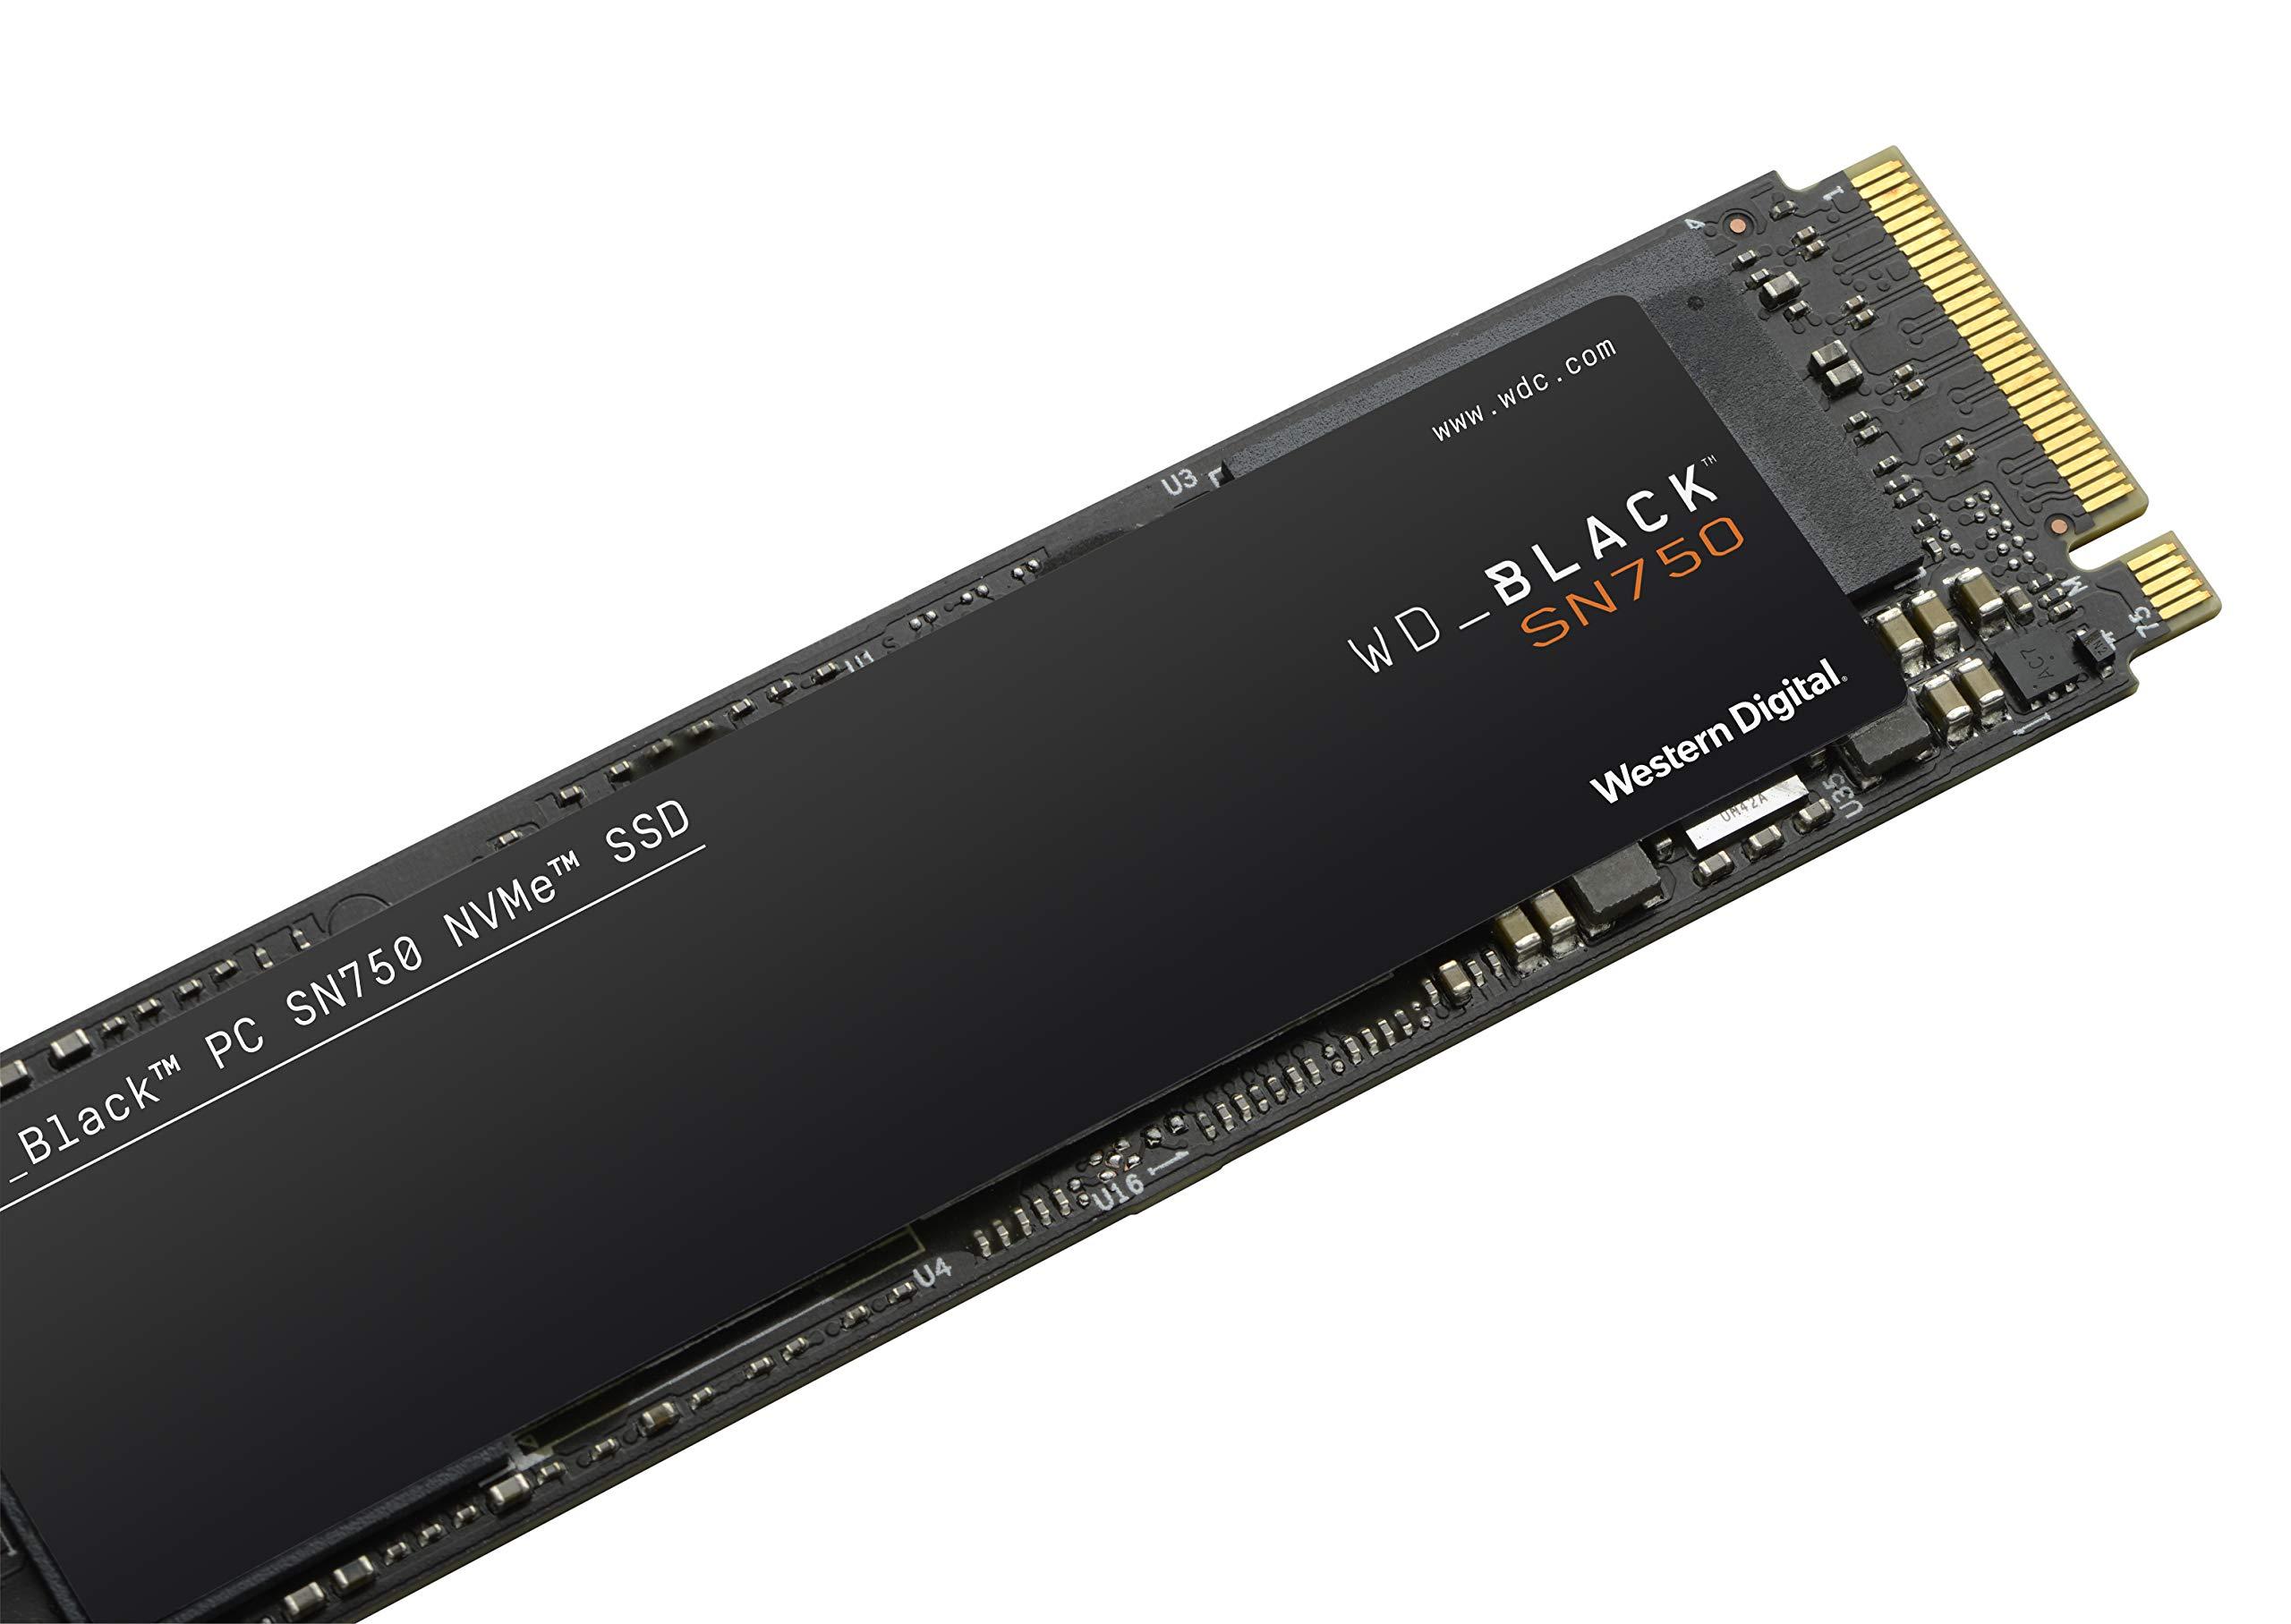 WD BLACK SN750 1TB NVMe Internal Gaming SSD - Gen3 PCIe, M.2 2280, 3D NAND - WDS100T3X0C by Western Digital (Image #4)